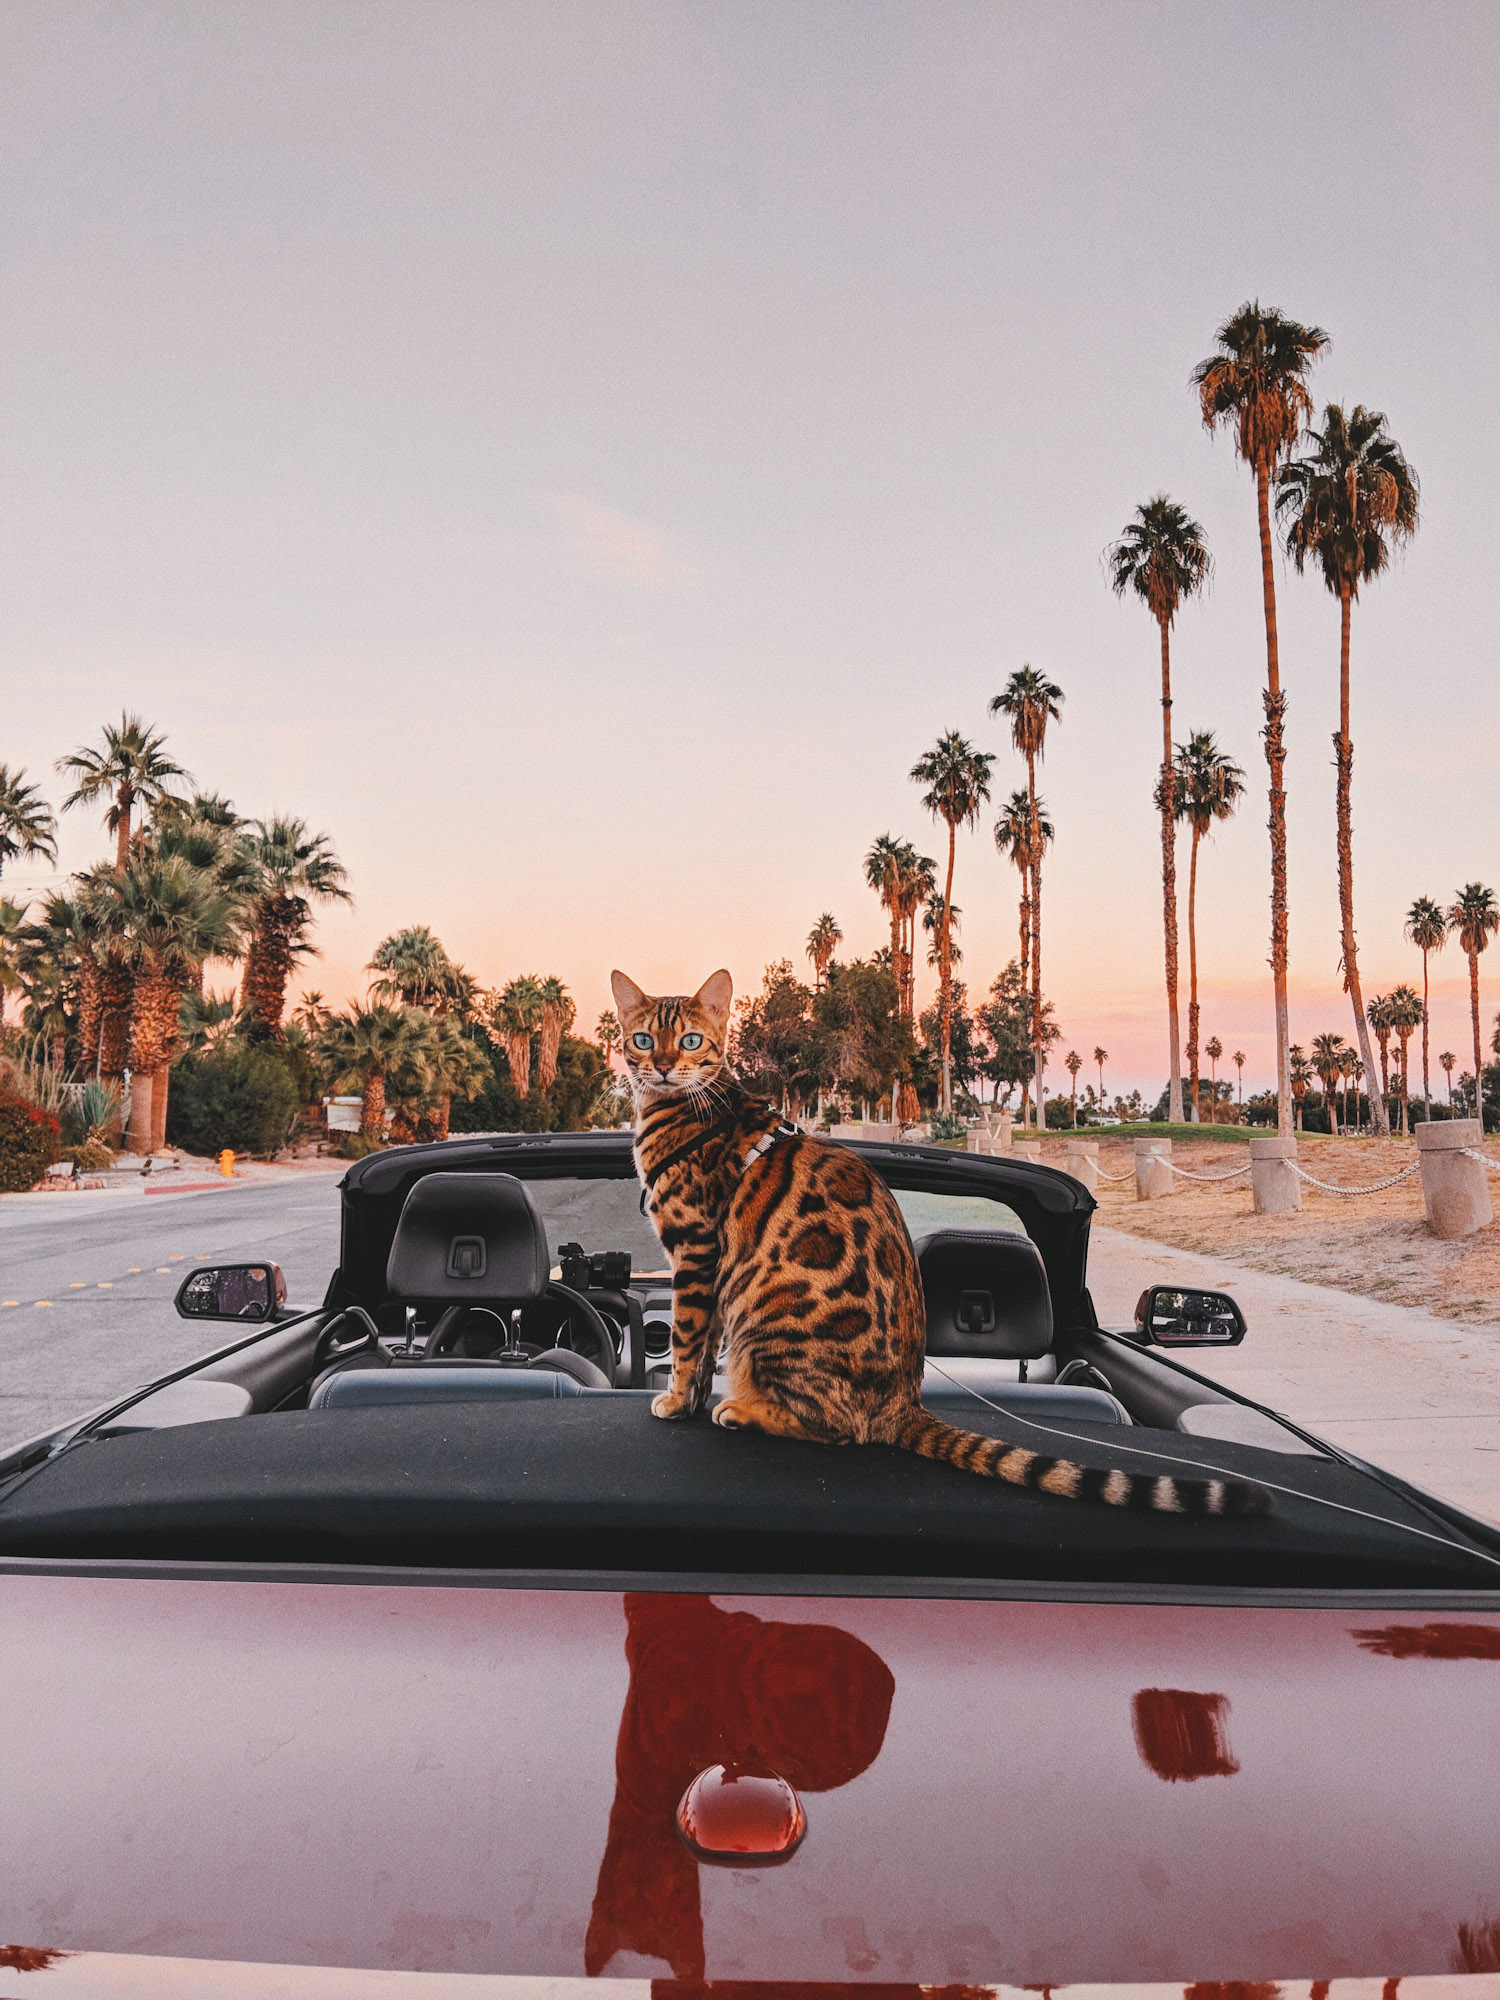 Suki cat sitting on convertible in California